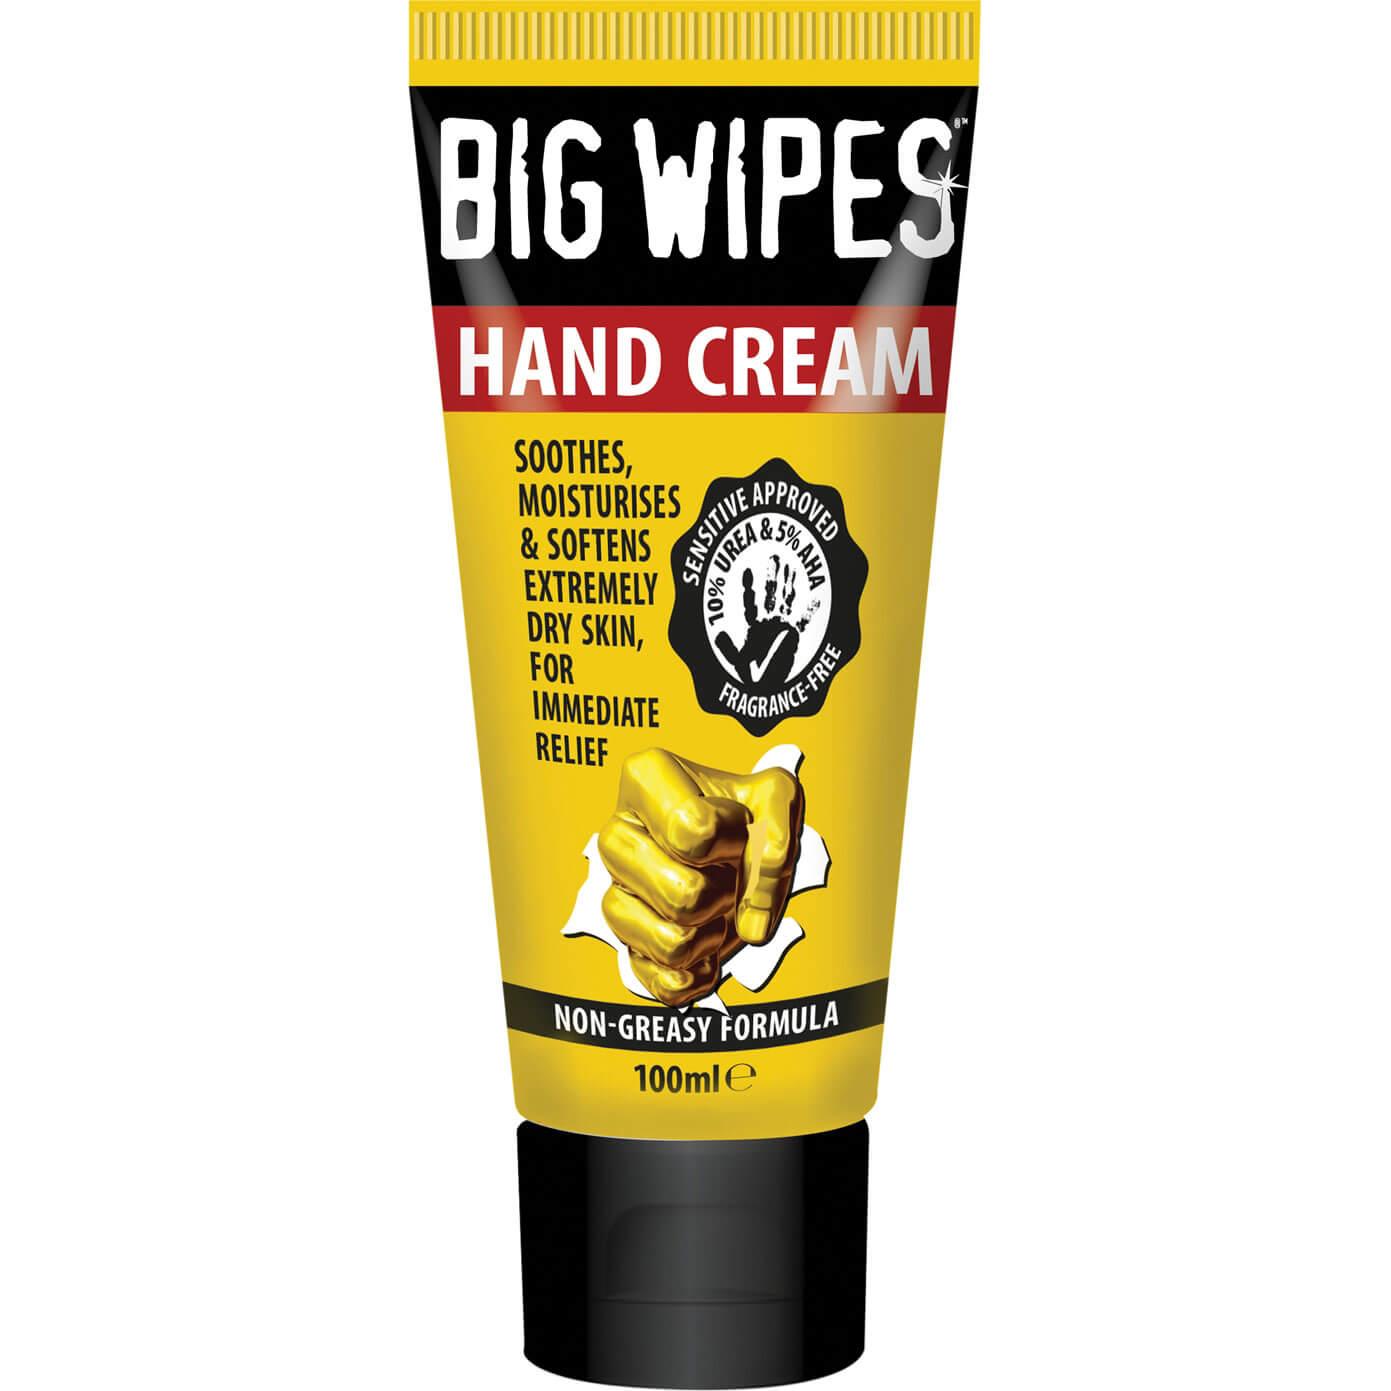 Image of Big Wipes Hand Cream 100ml